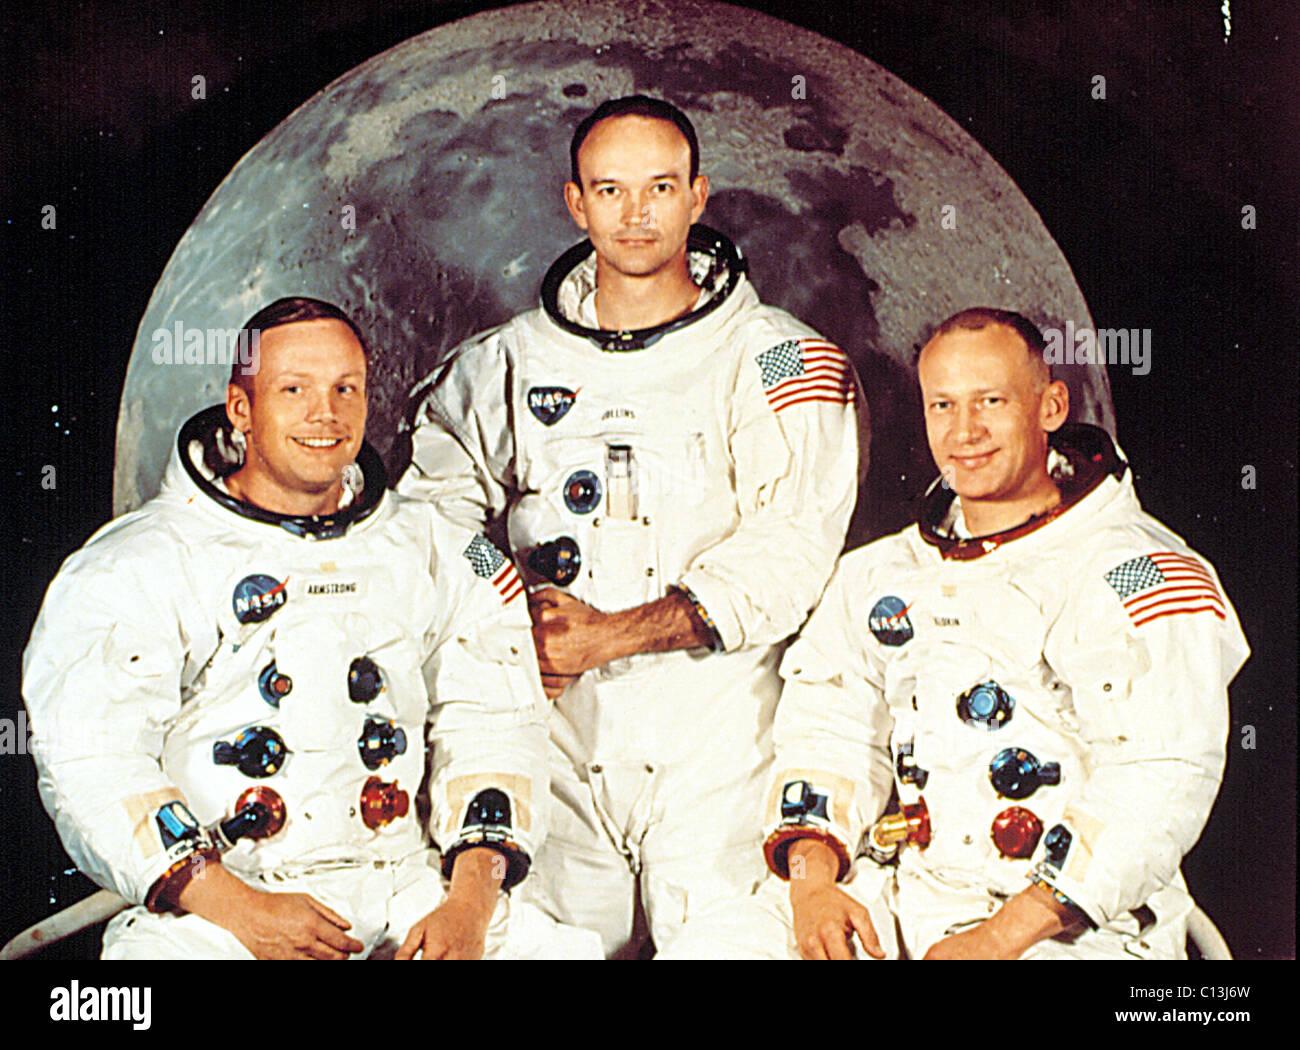 Astronauts & Space Travel Exploration Missions Nice Postcard Badge Apollo 11 Crew Neil Armstrong Moon Landing Space Astronautics